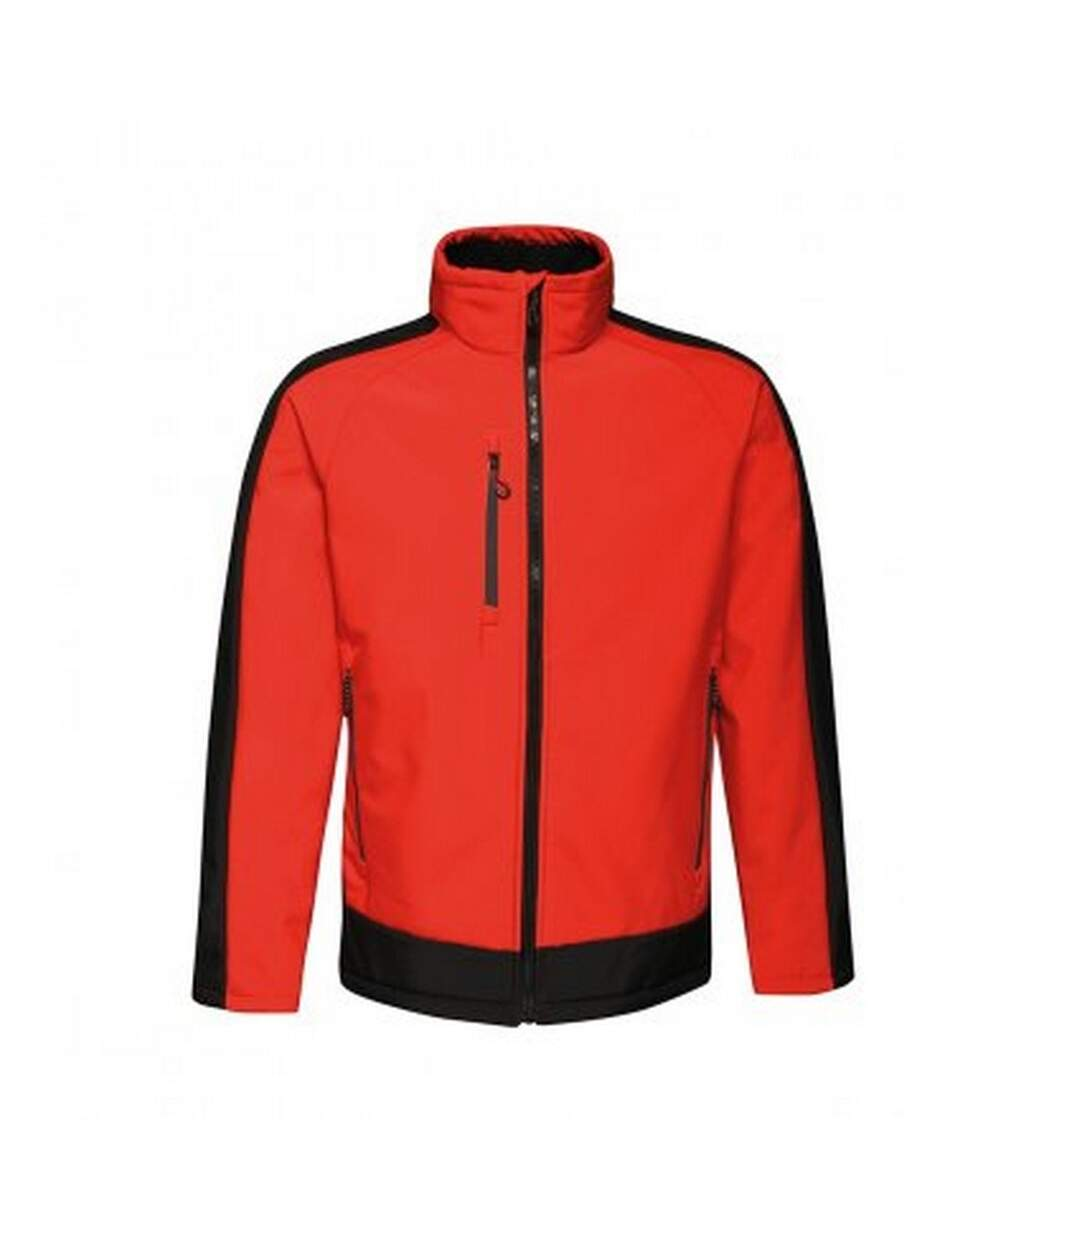 Regatta  Mens Contrast Three Layer Printable Soft Shell Jacket (Classic Red/Black) - UTPC3318